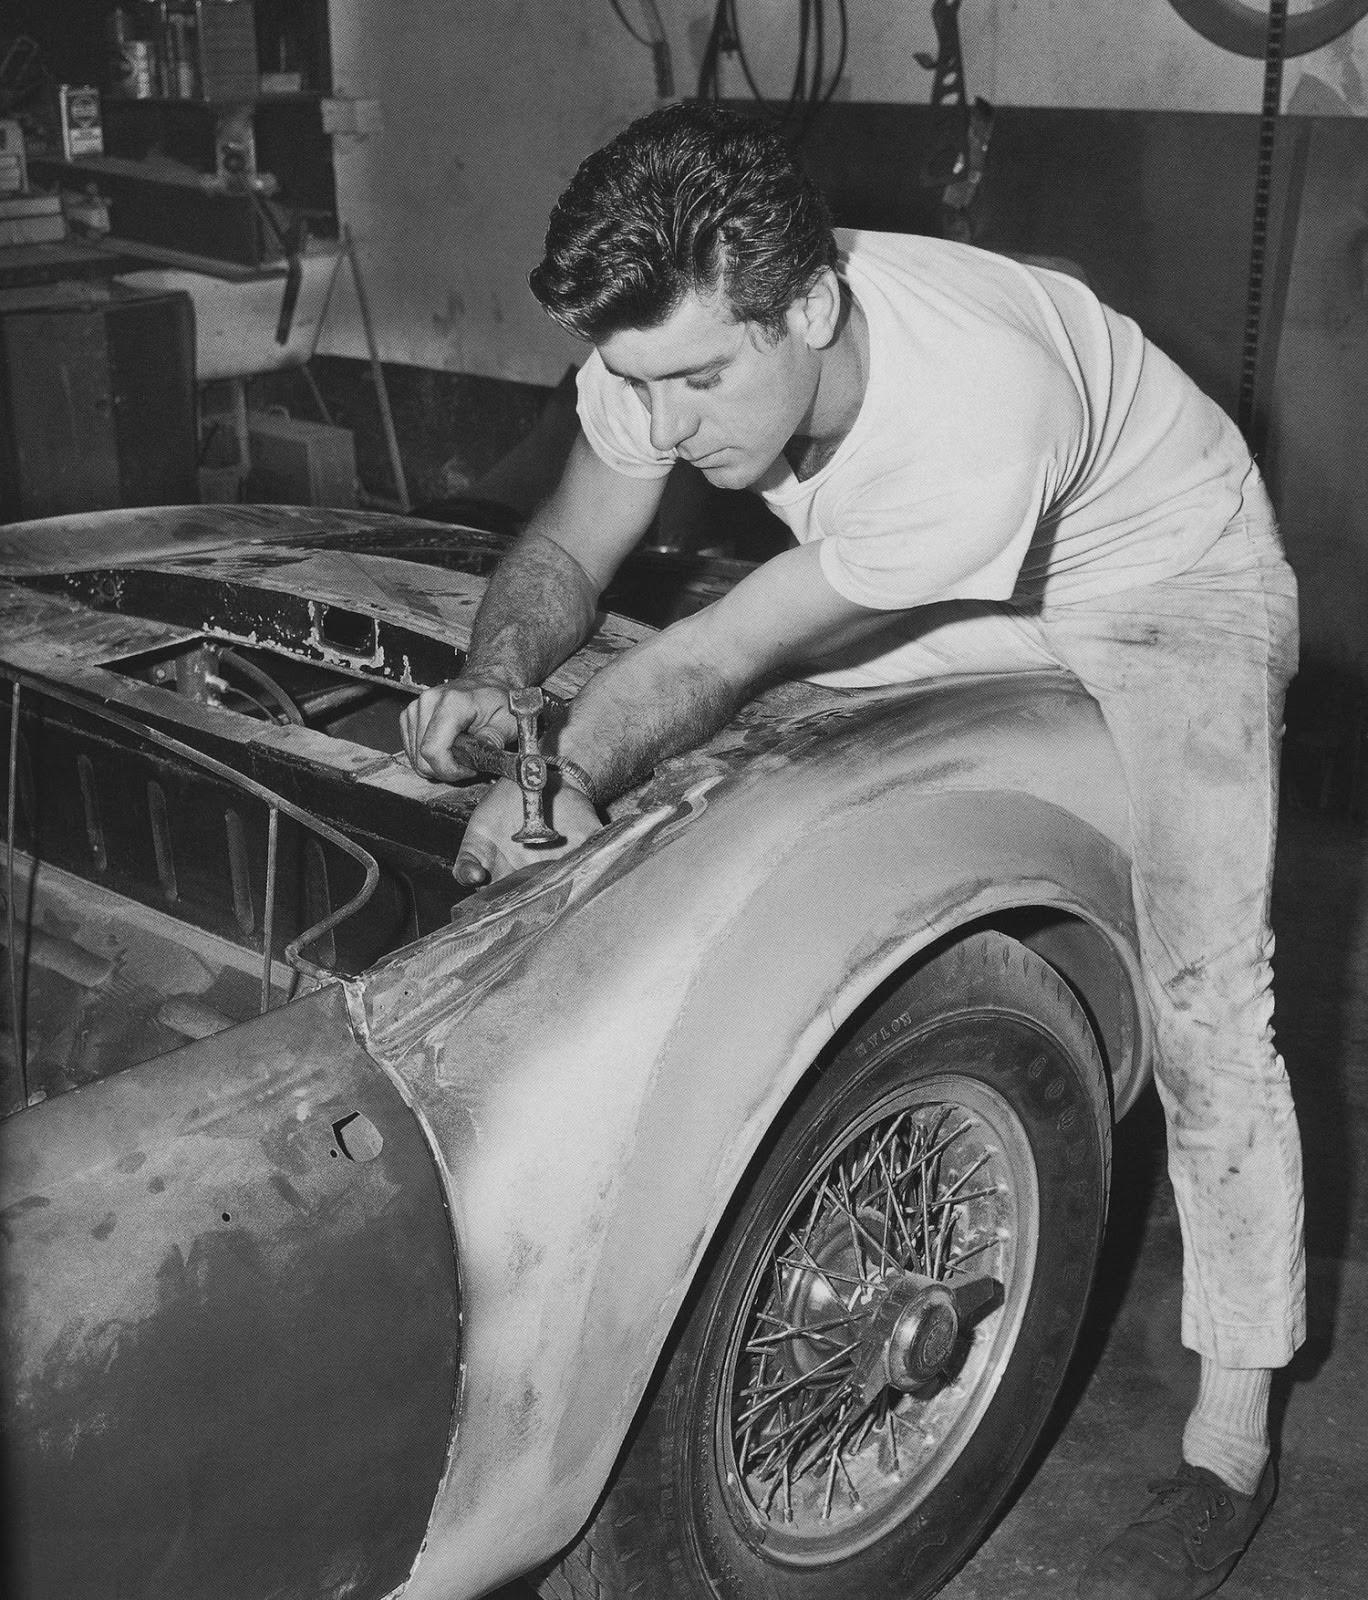 RETRO KIMMER'S BLOG: DEAN JEFFRIES HOLLYWOOD CAR DESIGNER